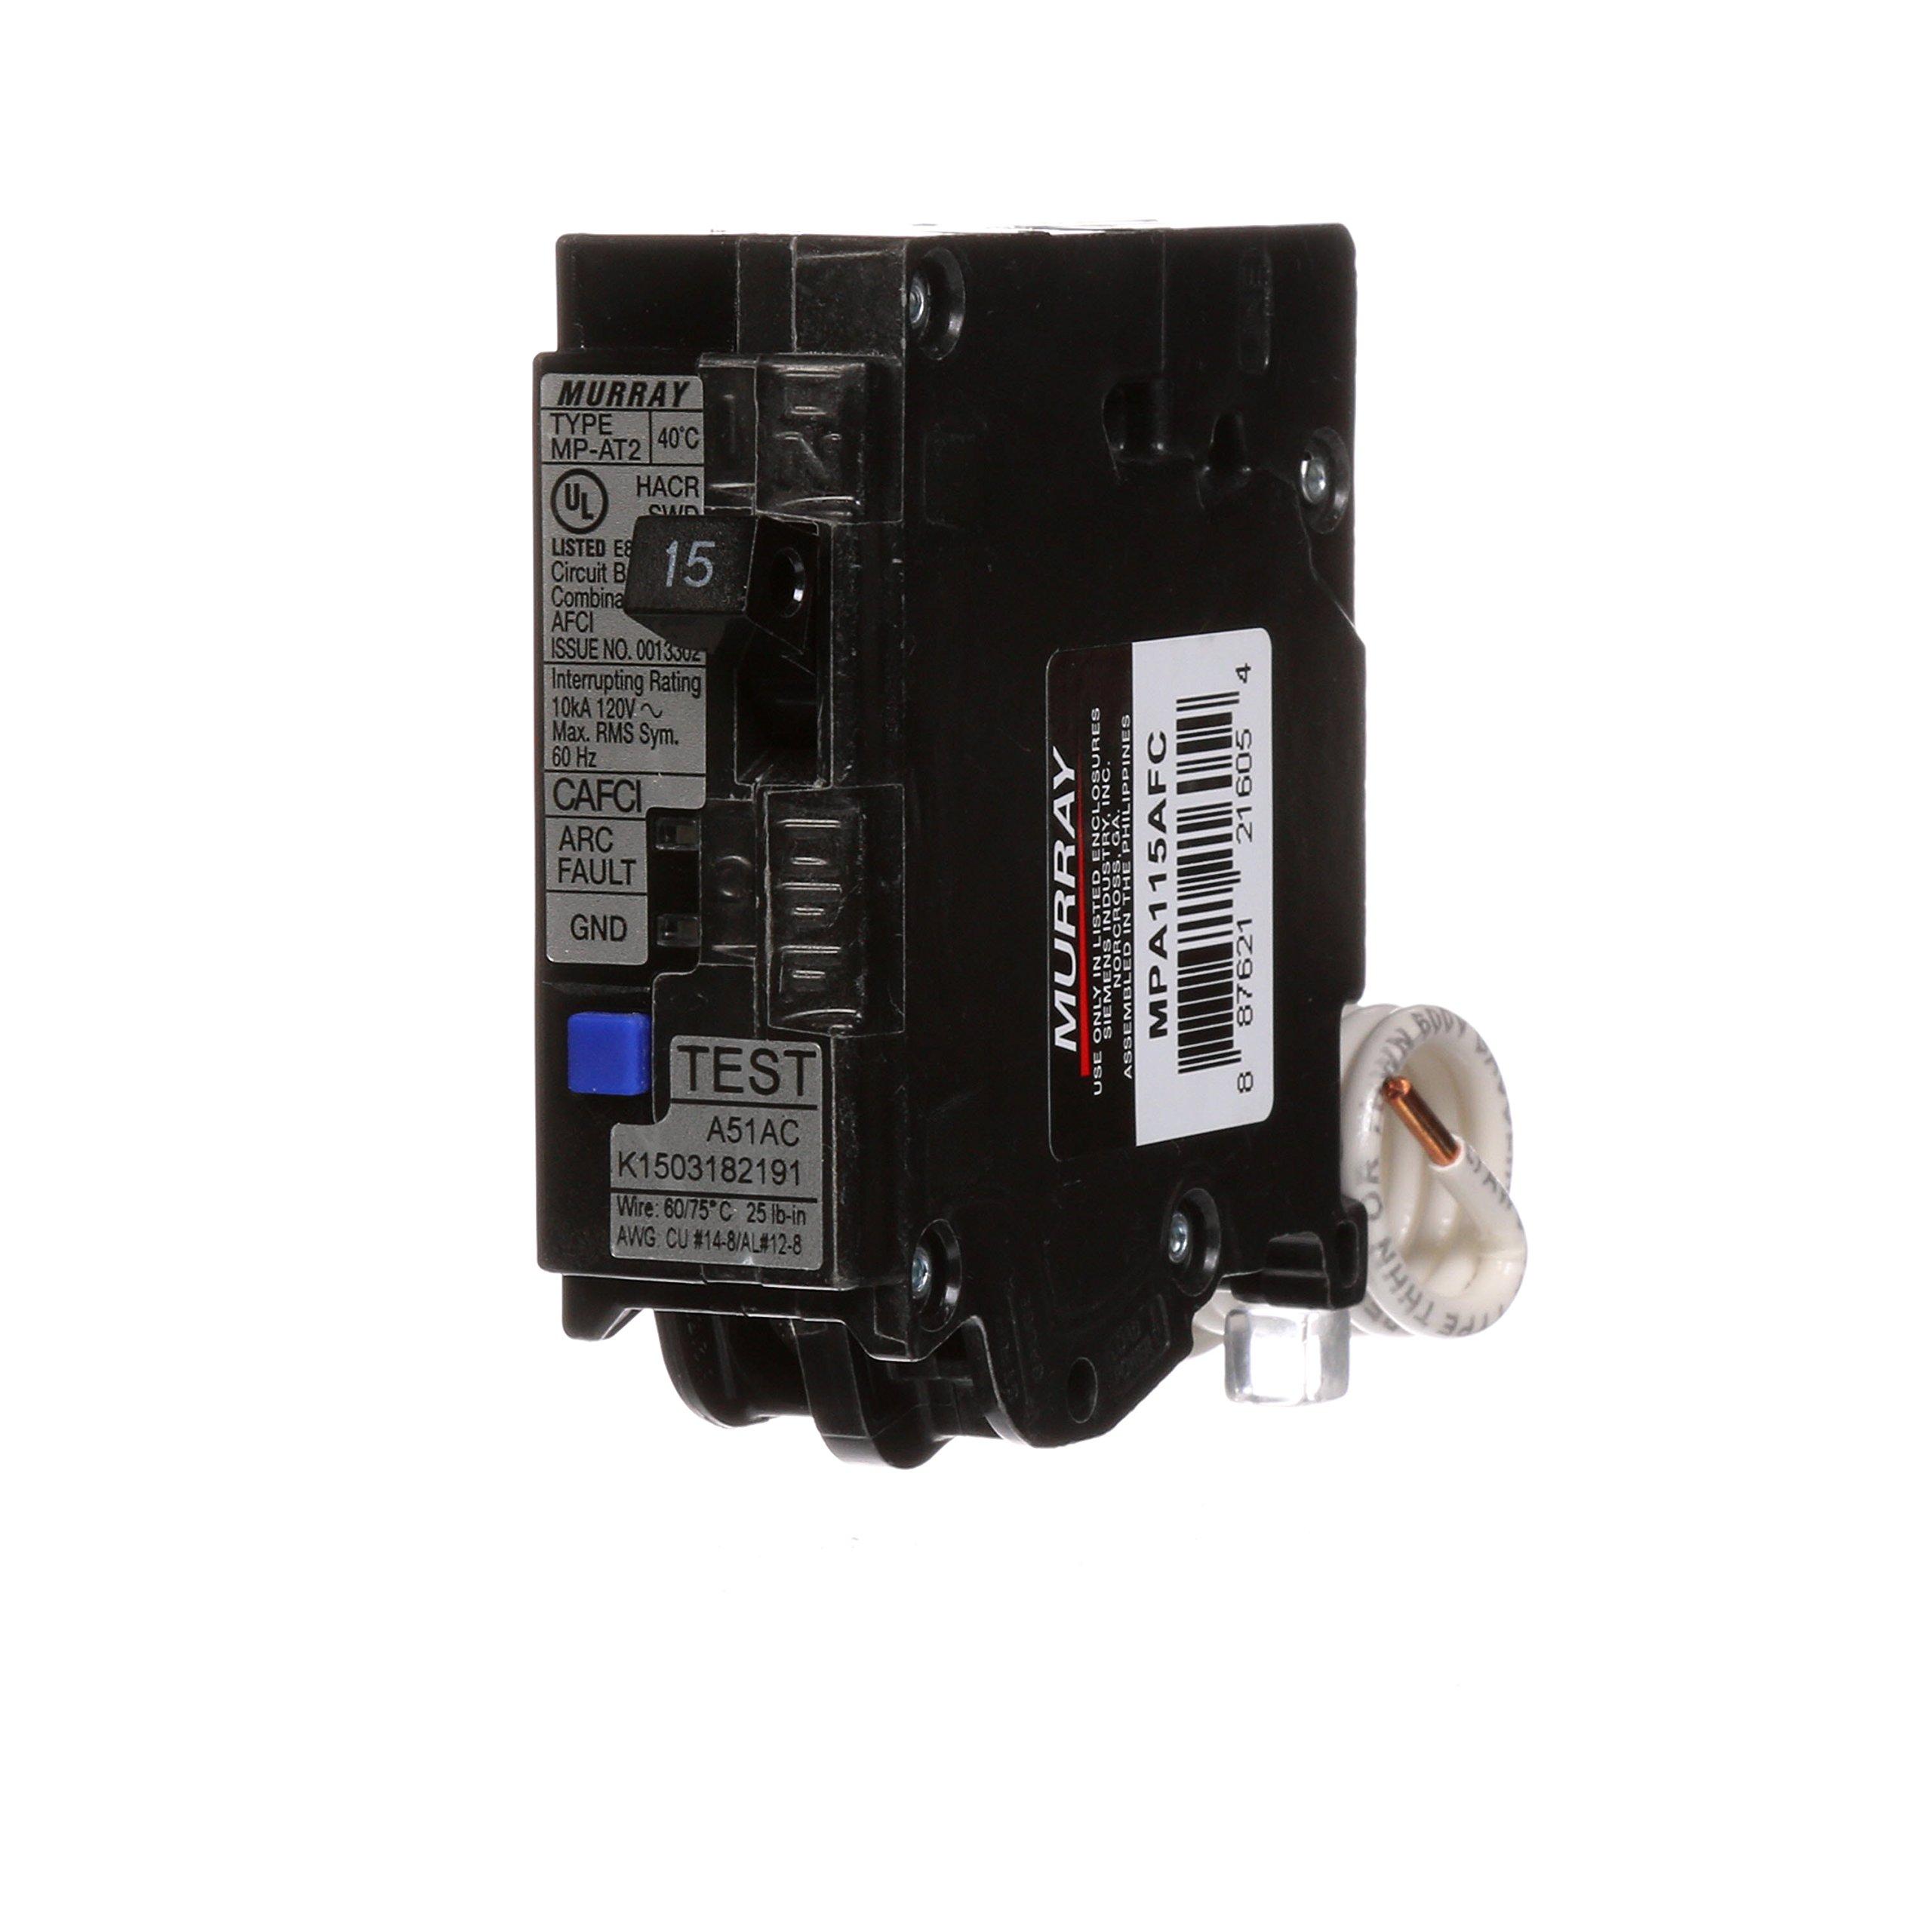 Square D Homeline Arc Fault Circuit Breakers Smart Wiring Diagrams Breaker Bedroom Code Www Indiepedia Org Termination